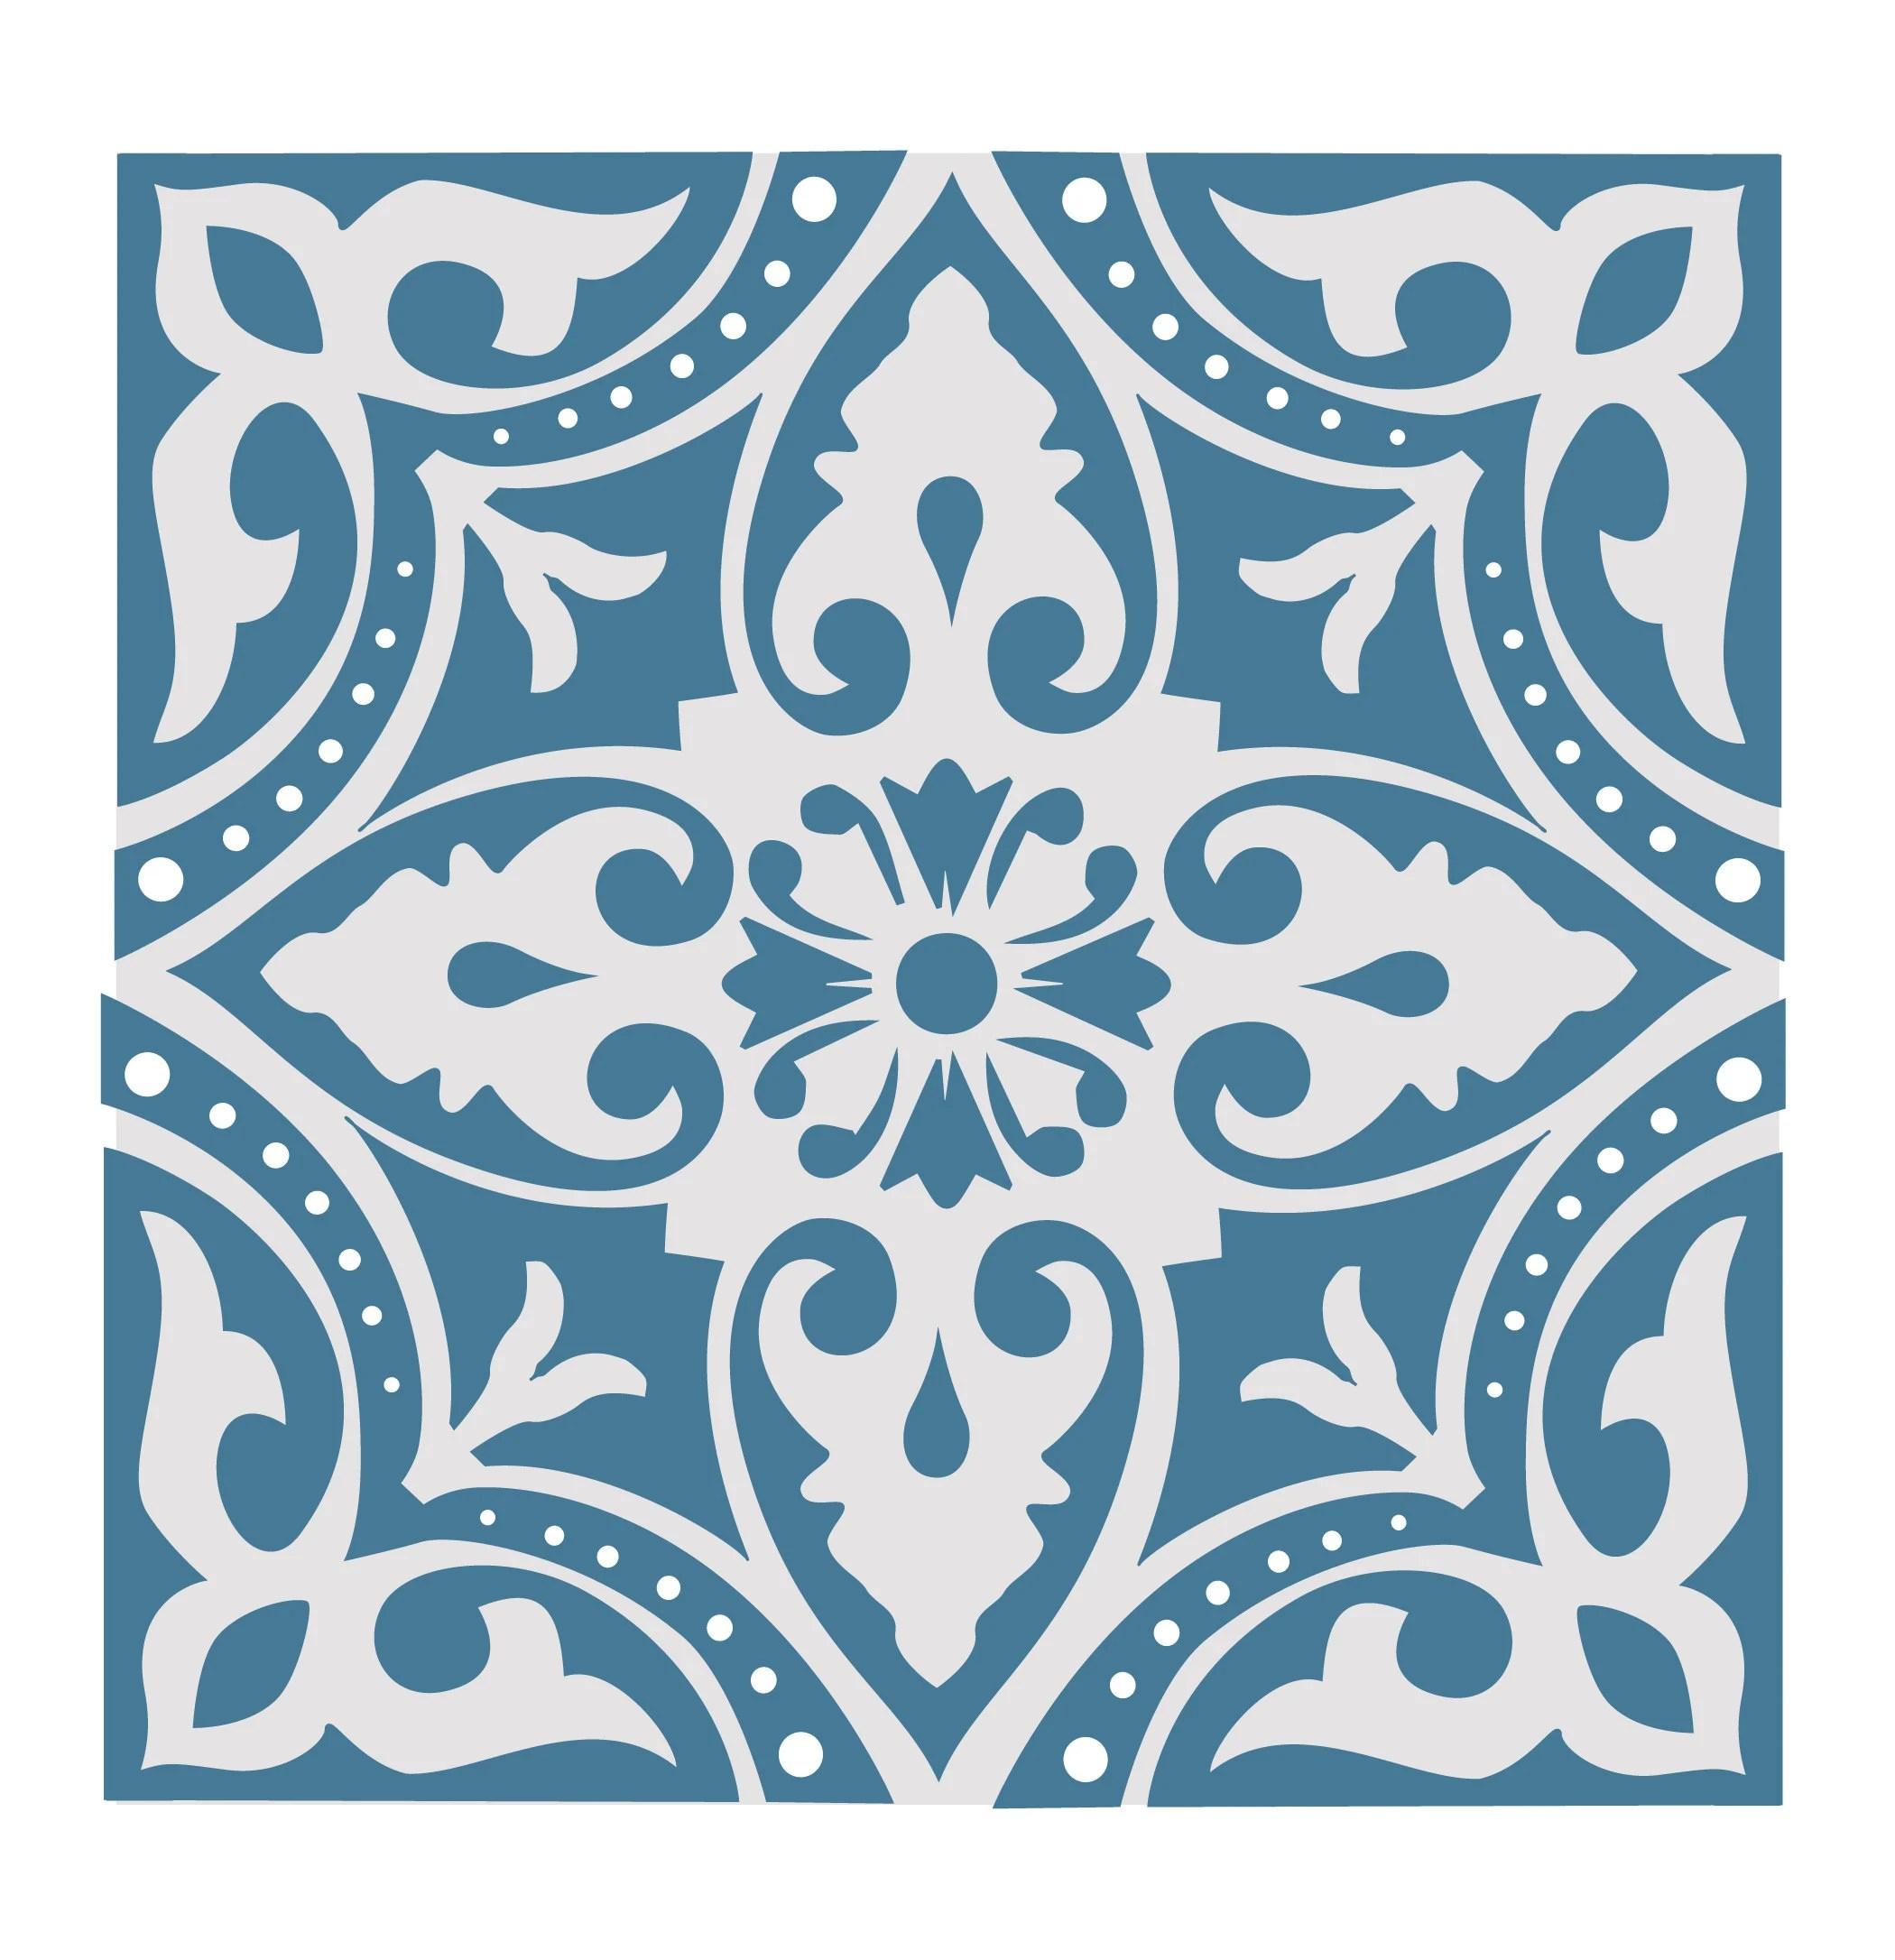 dantel modern handpainted tile 6x6 kitchen backsplash etsy